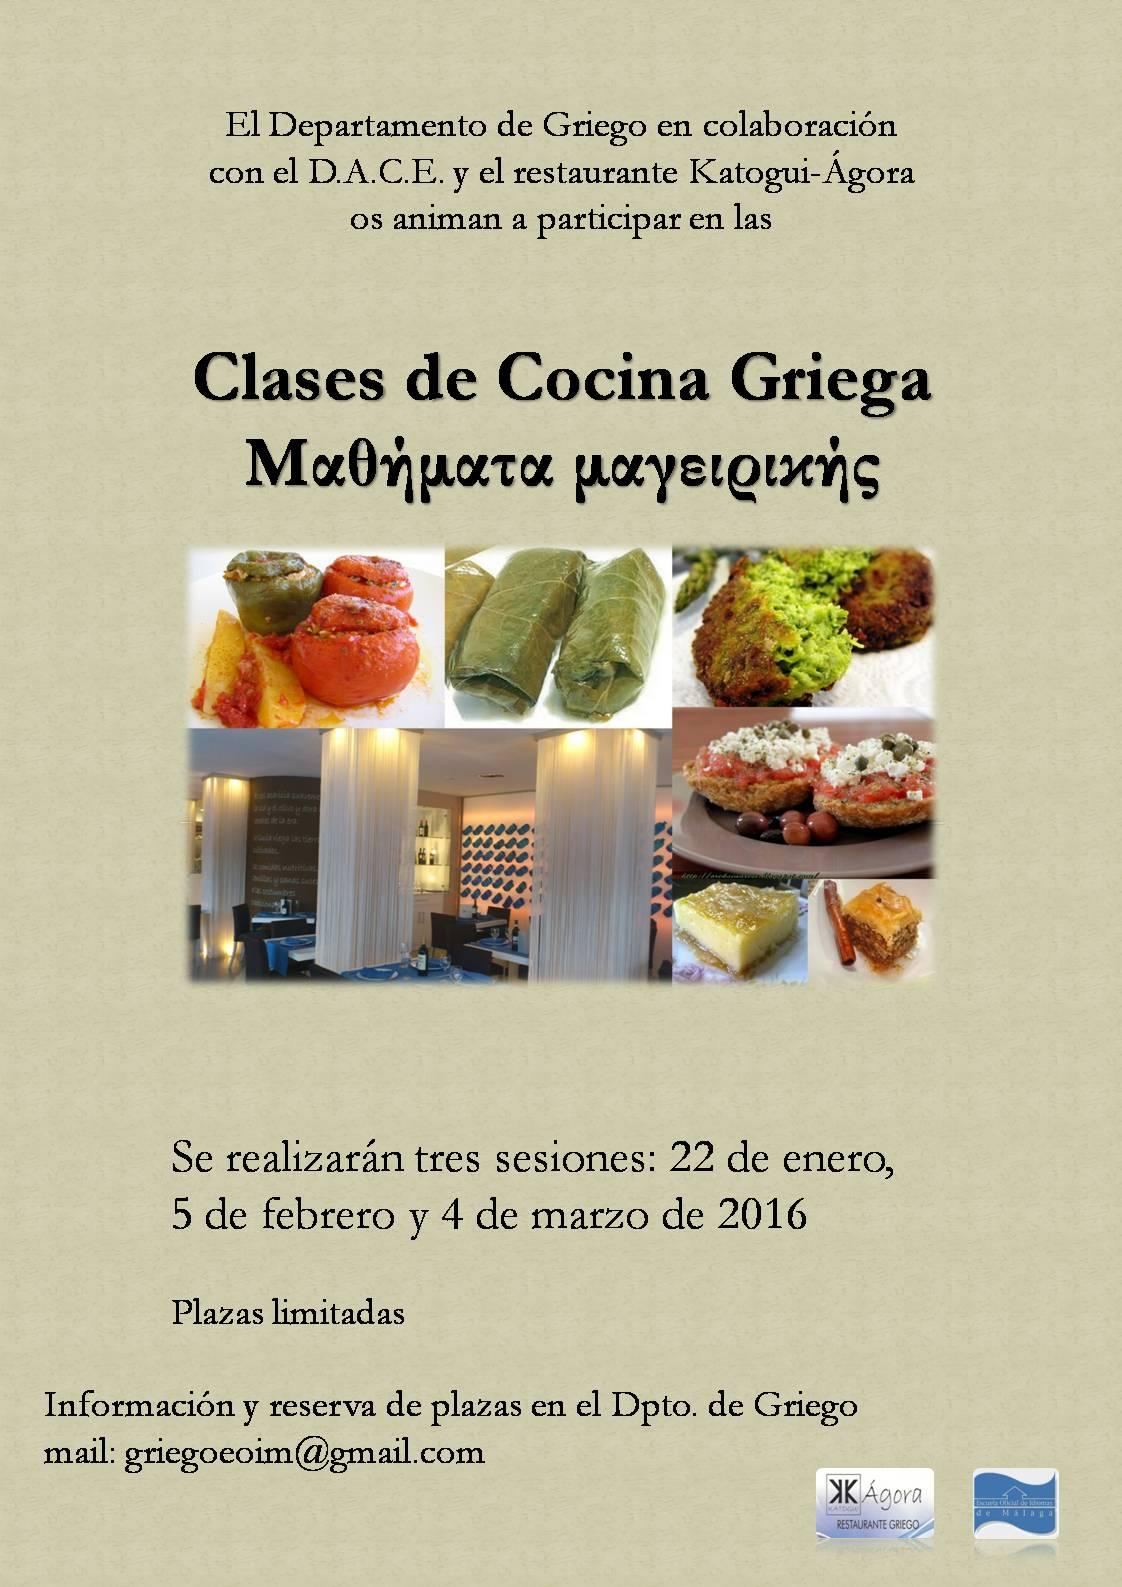 Clases de cocina griega departamento de actividades - Cursos de cocina en malaga ...